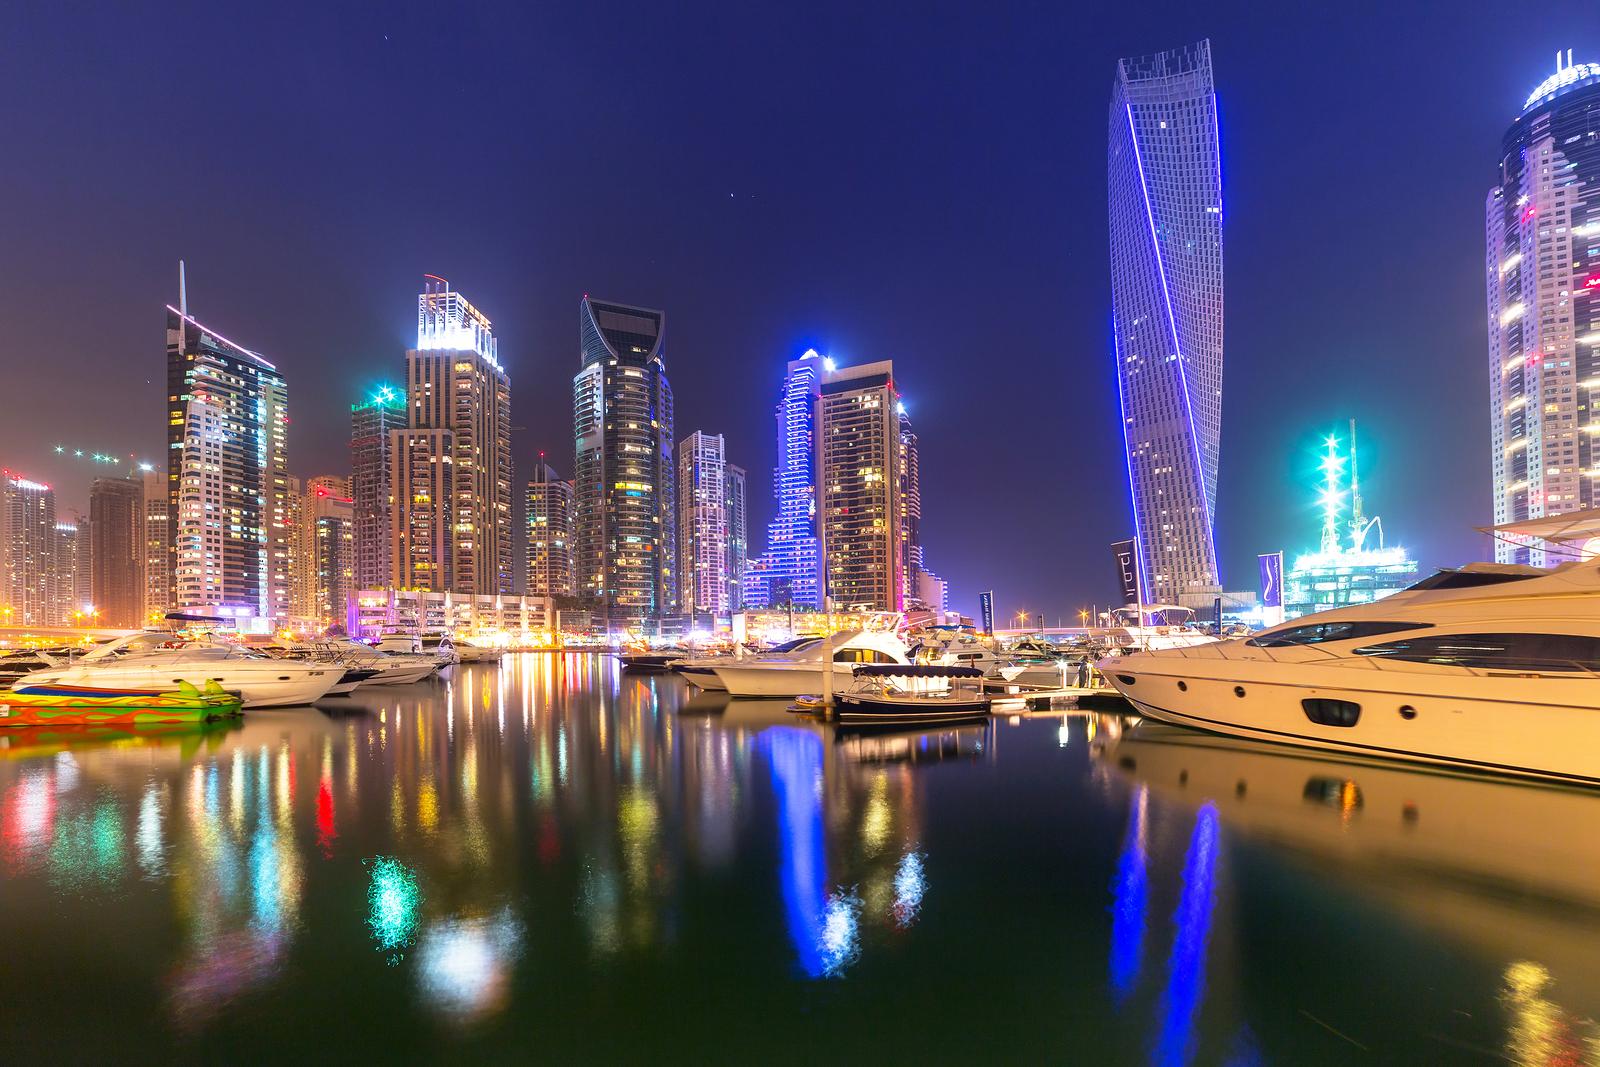 Emirates Wallpaper Hd 6 Nights 7 Days Luxury Magic Dubai And Abu Dhabi Go